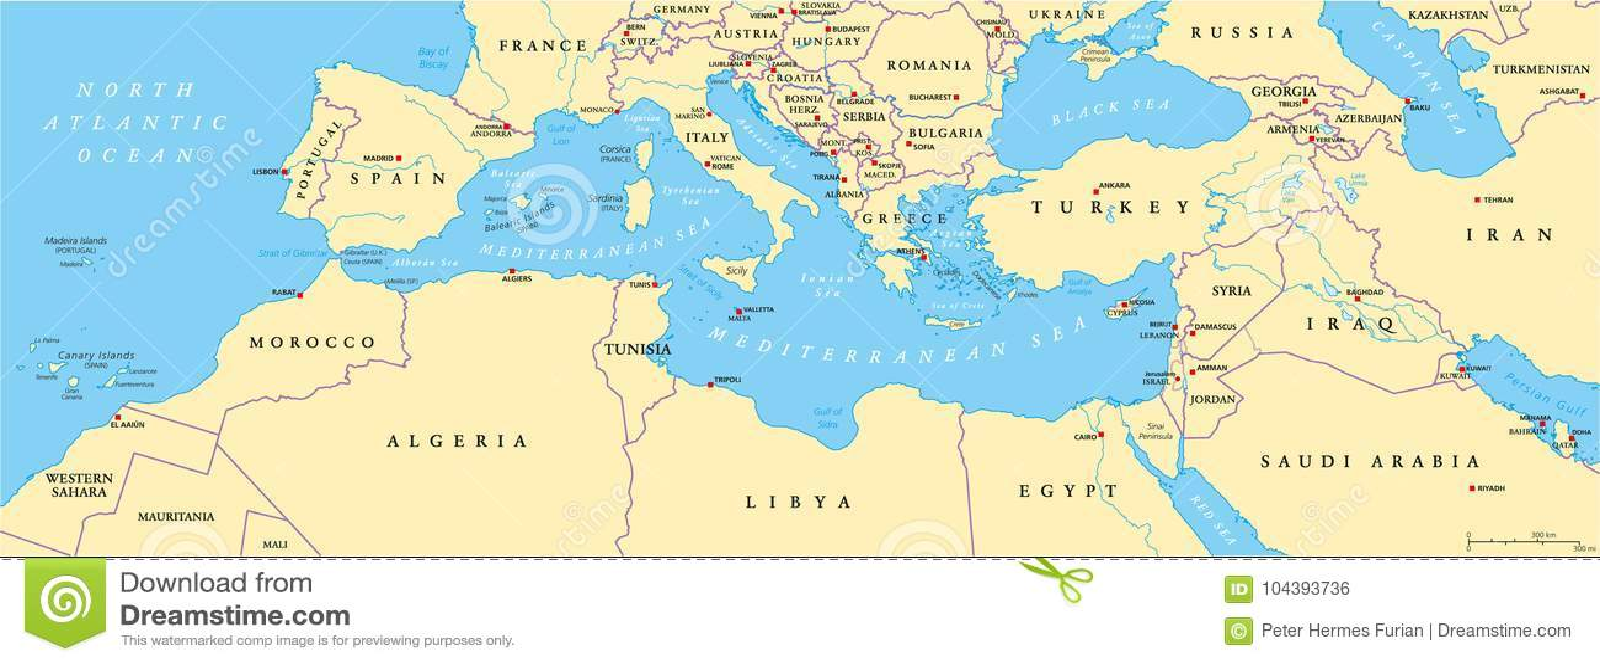 Carte politique de bassin méditerranéen